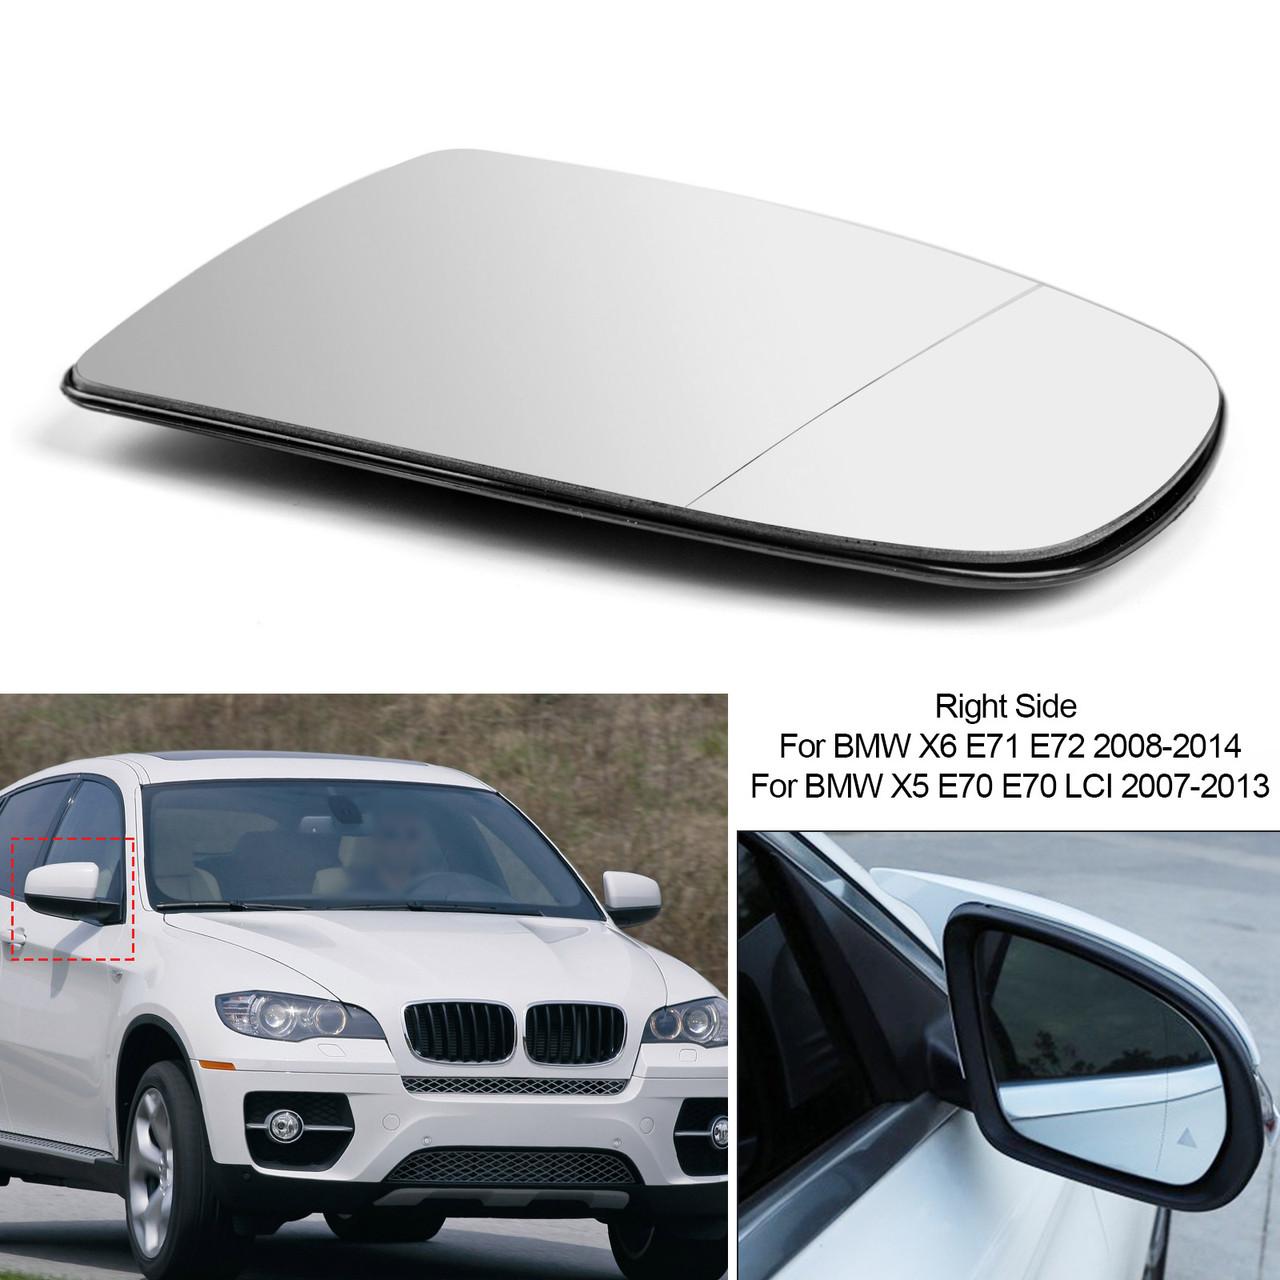 BMW X5 X6 E70 E71 E72 Heated Wing Side Mirror